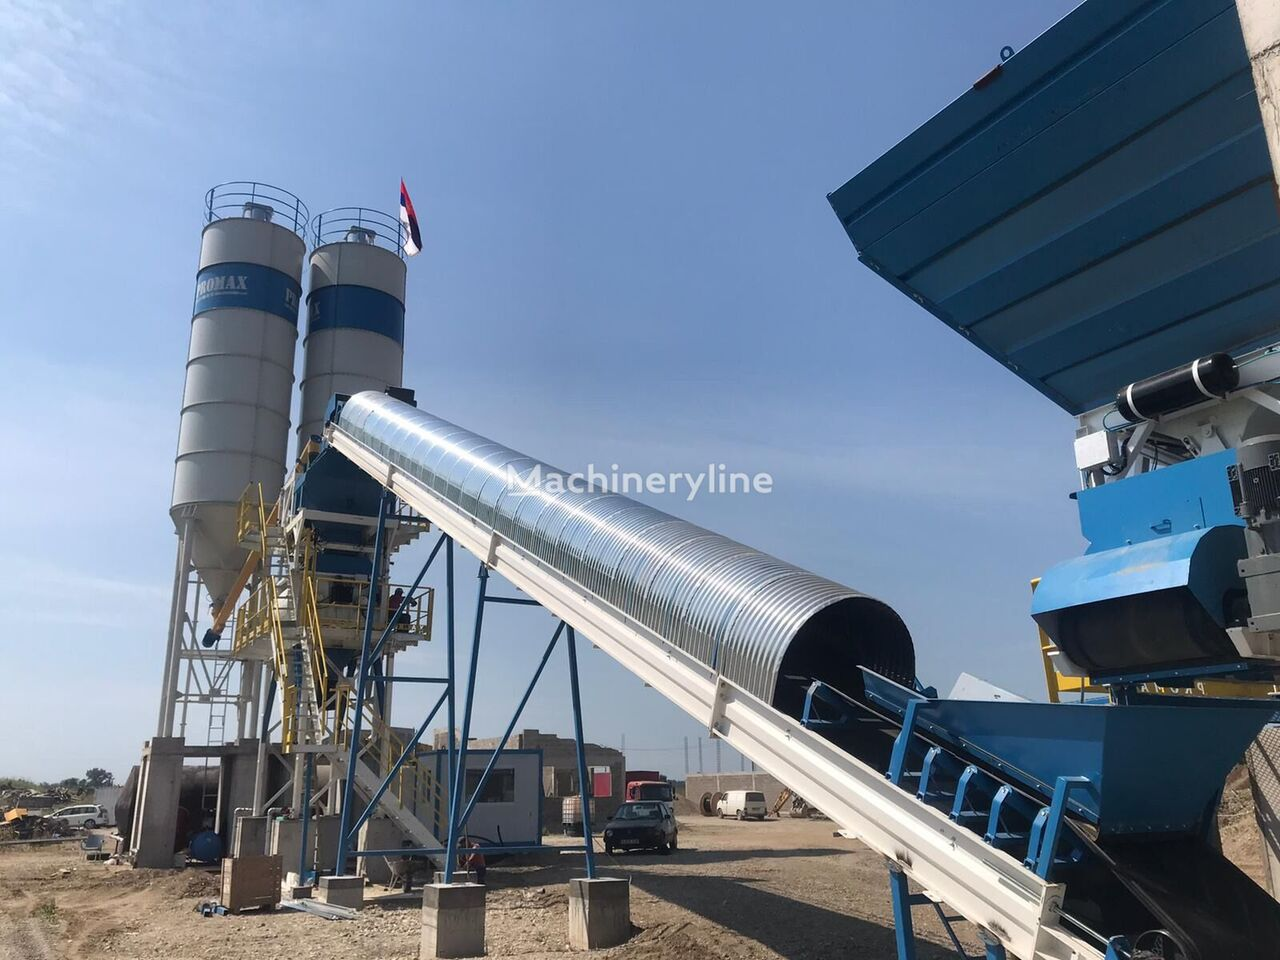 ny PROMAX STATIONARY Concrete Batching Plant S100 TWN (100m³/h) betongfabrikk